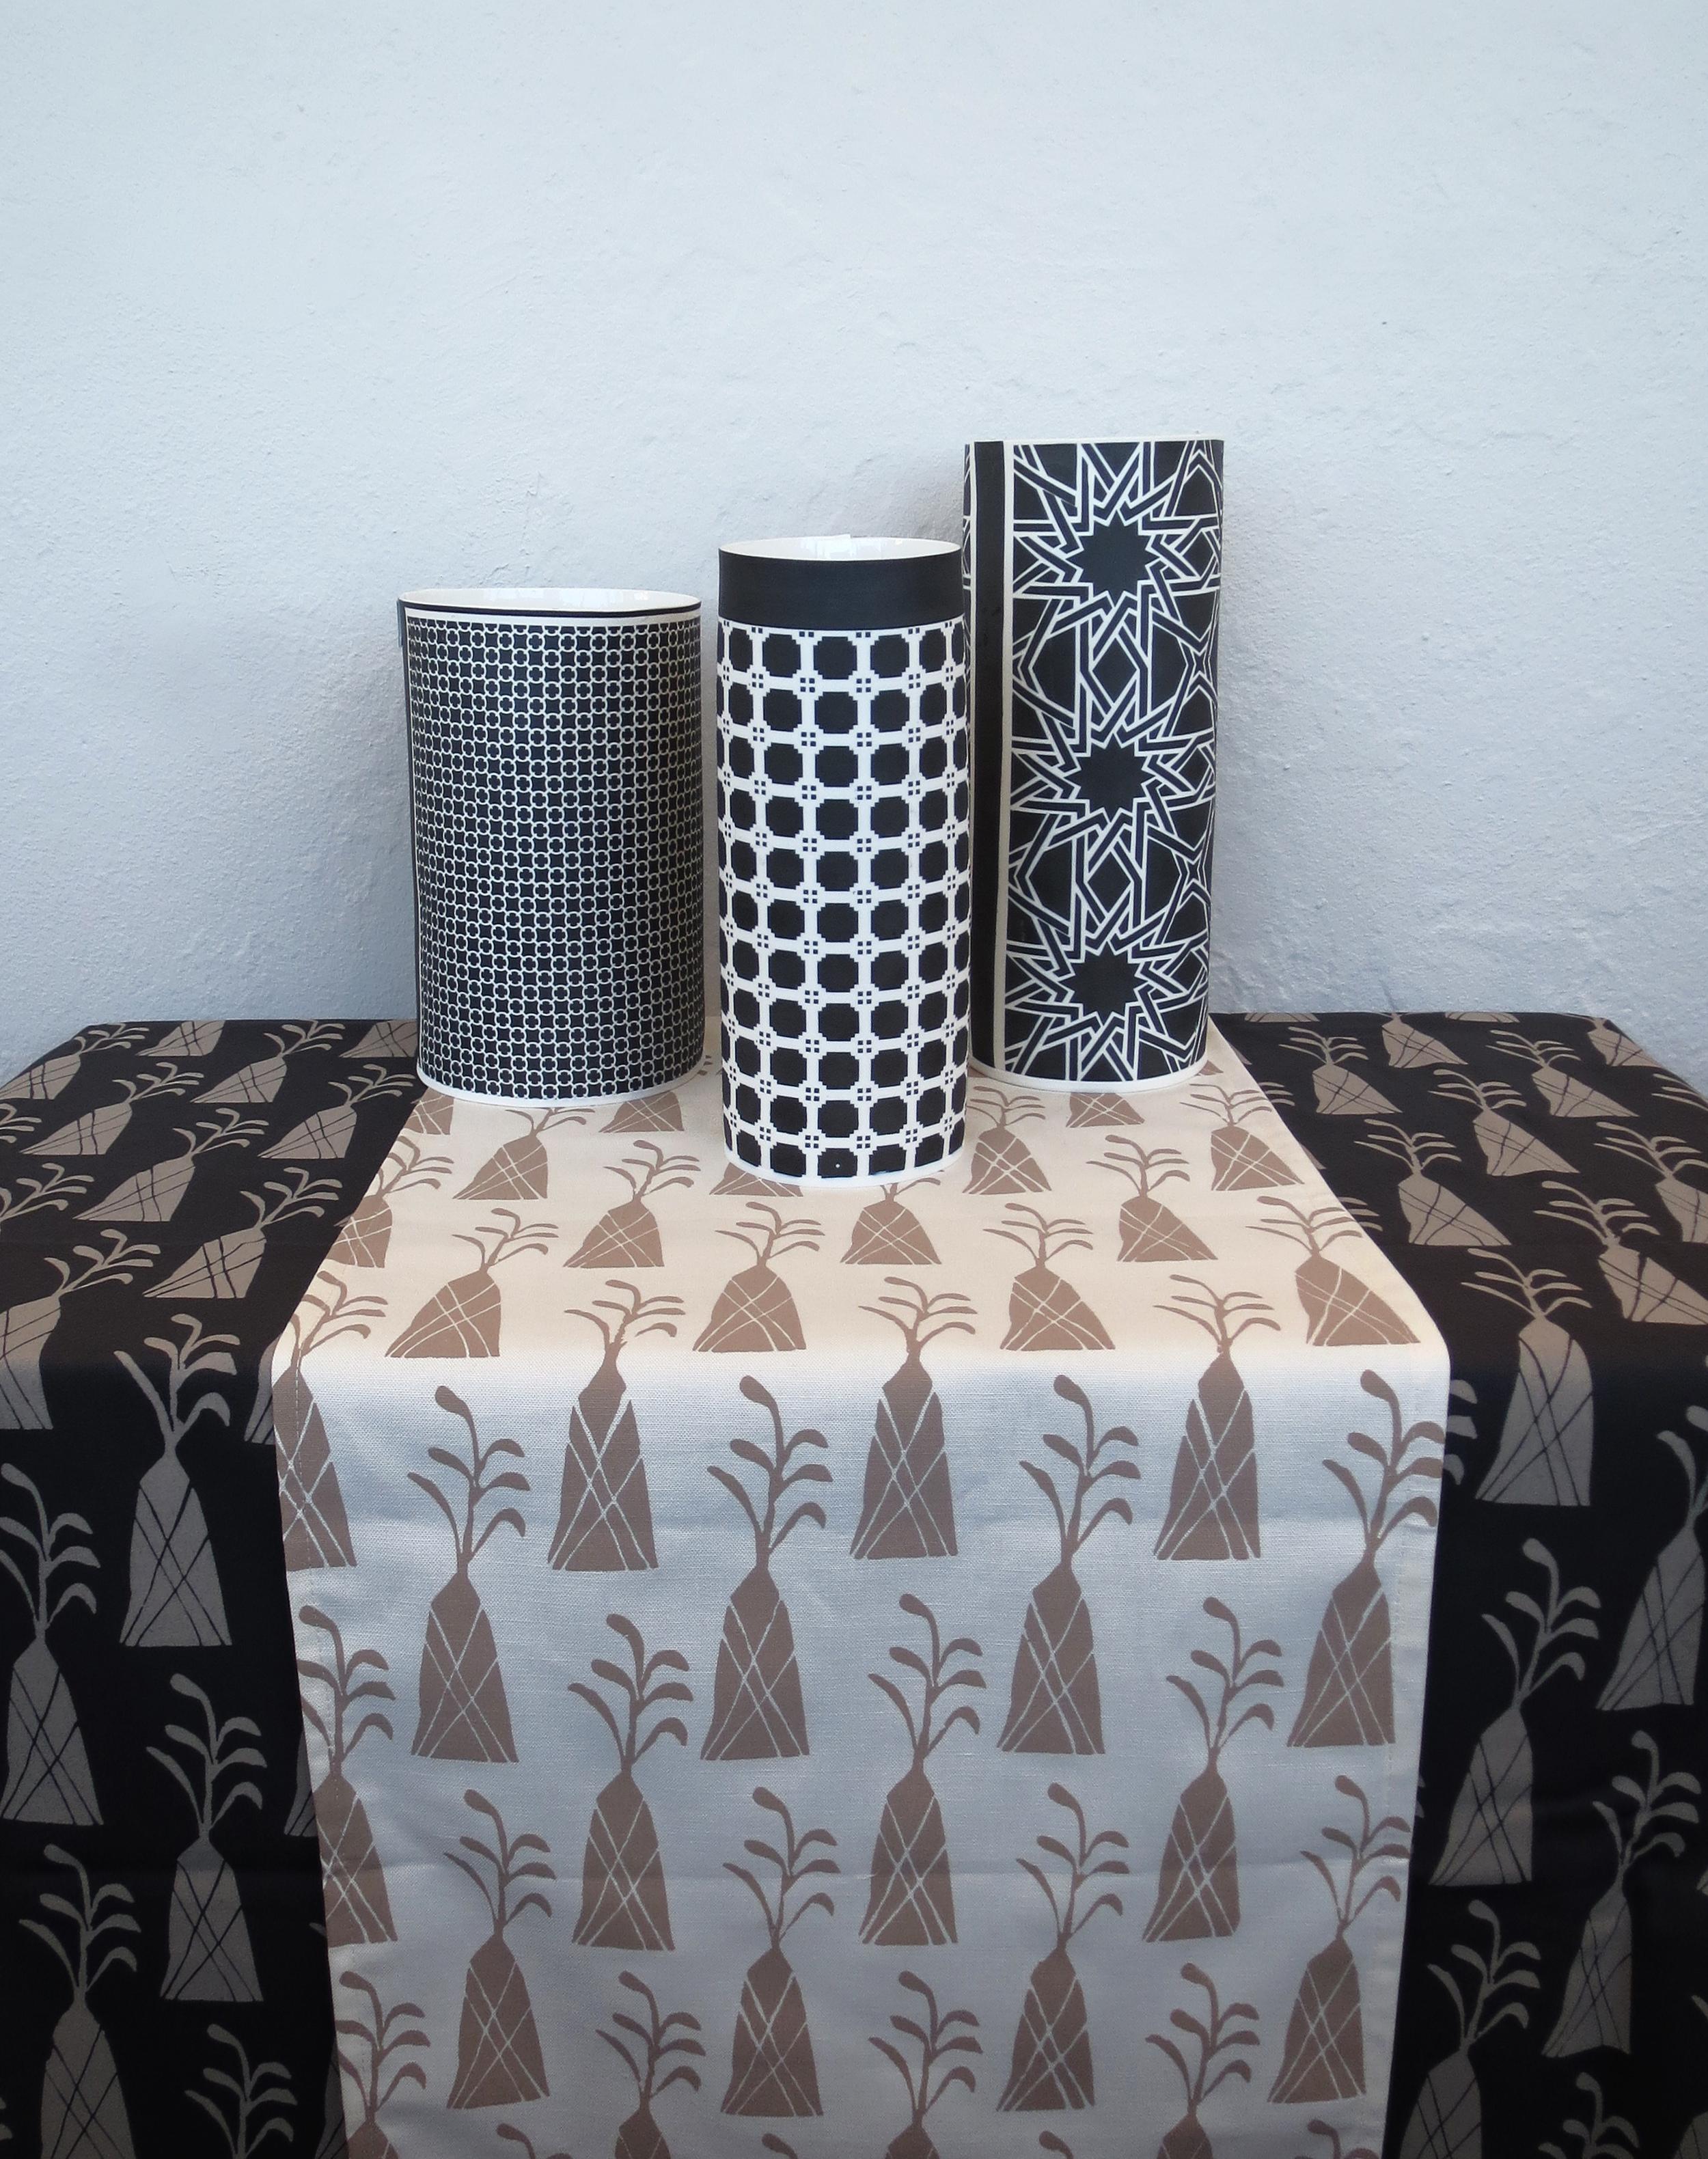 Tablecloth shot 3.jpg